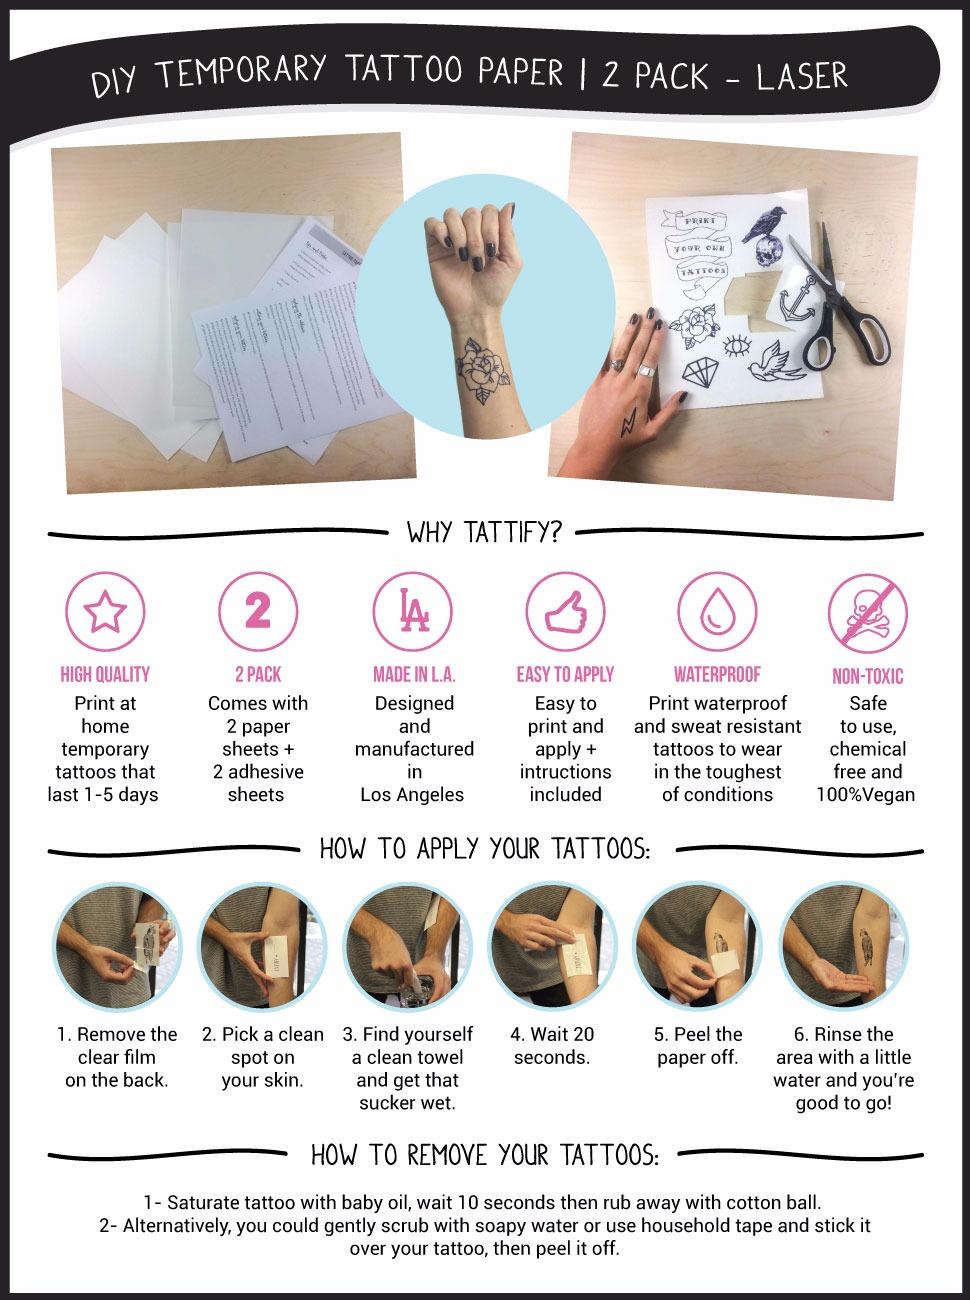 Tattify Diy Temporary Tattoo Paper 2 Sheet Pack For Laser Printers Printable Long Lasting Custom Tattoos